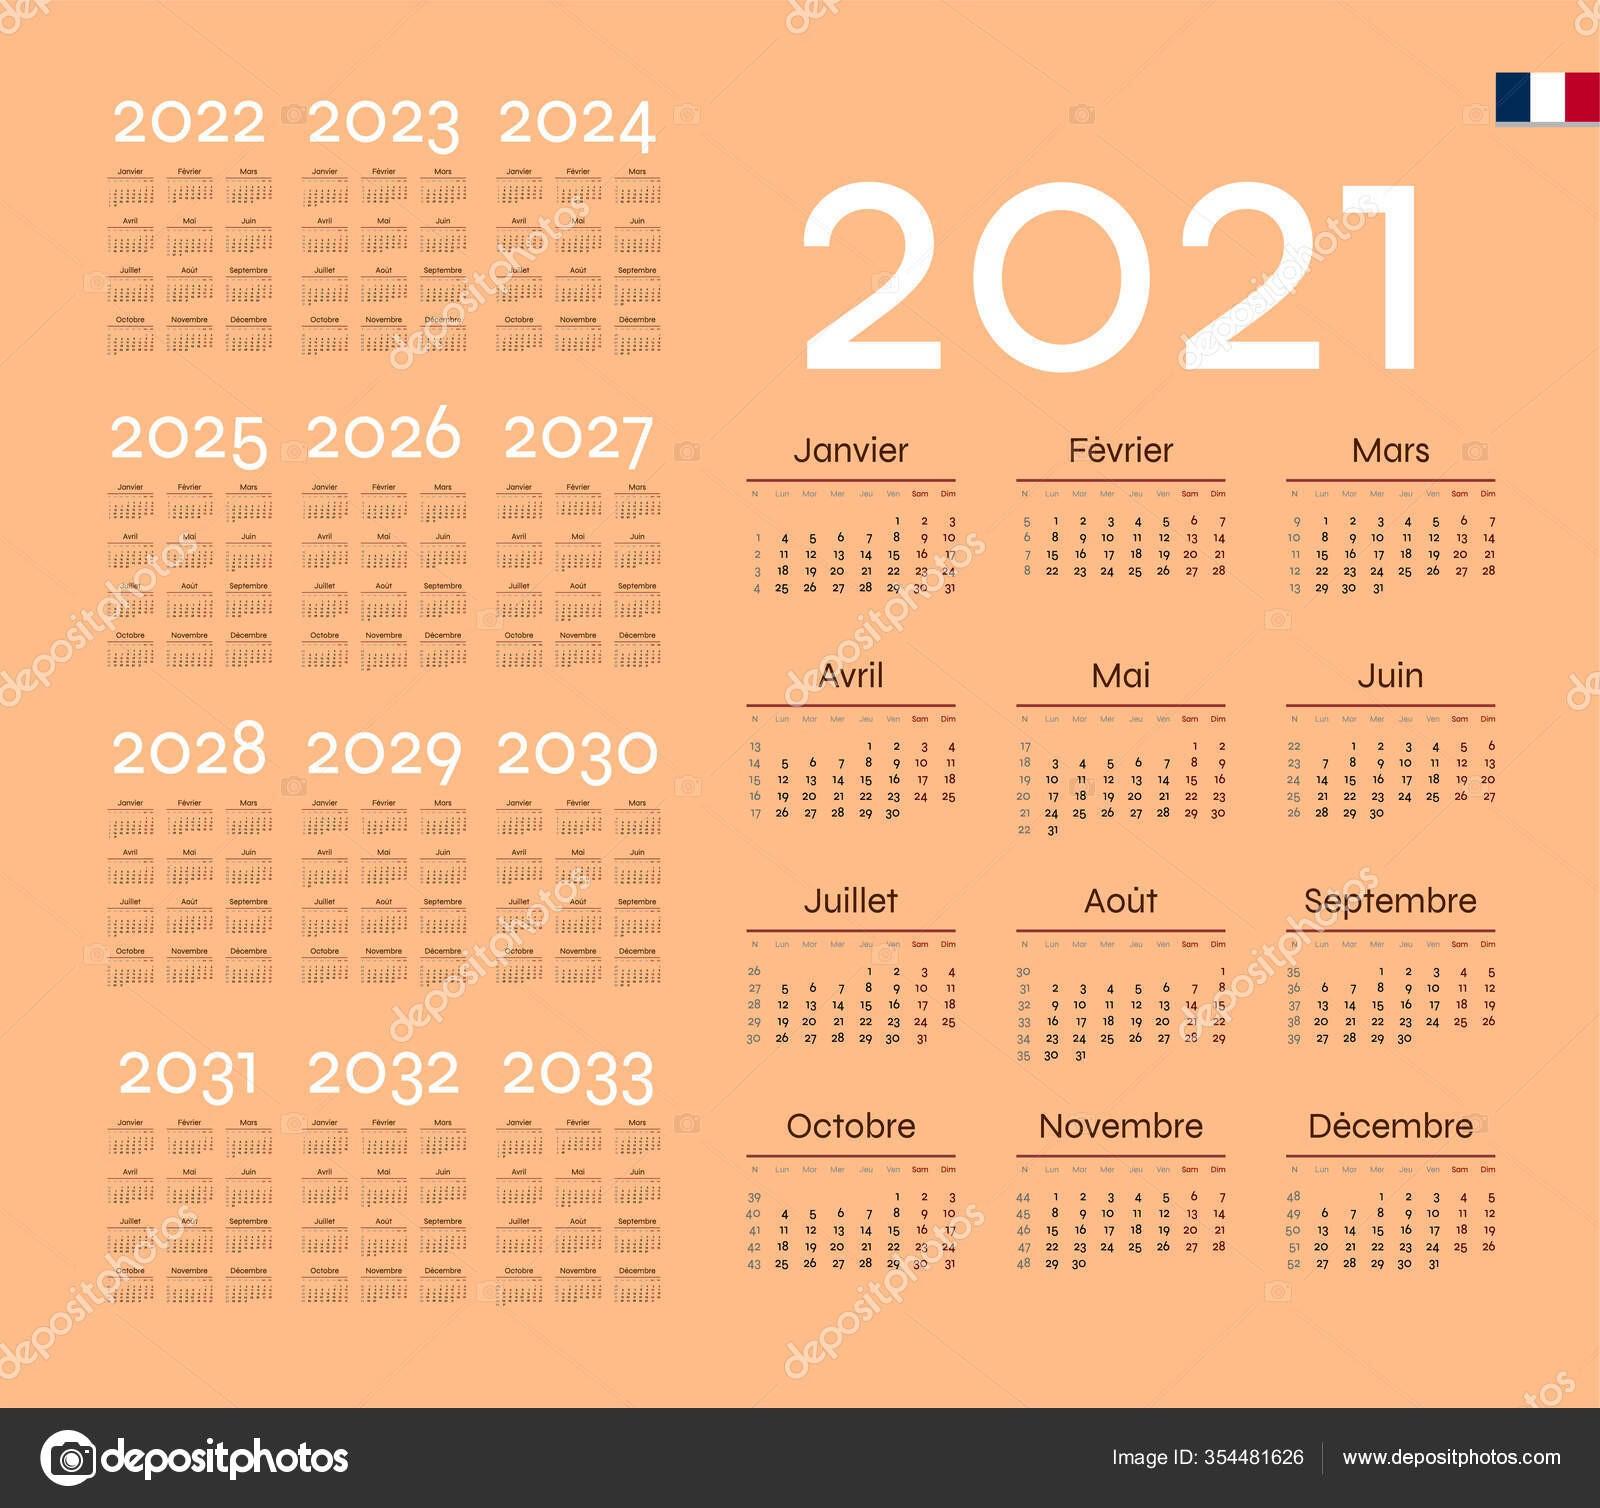 depositphotos stock illustration french calendar 2021 week starts